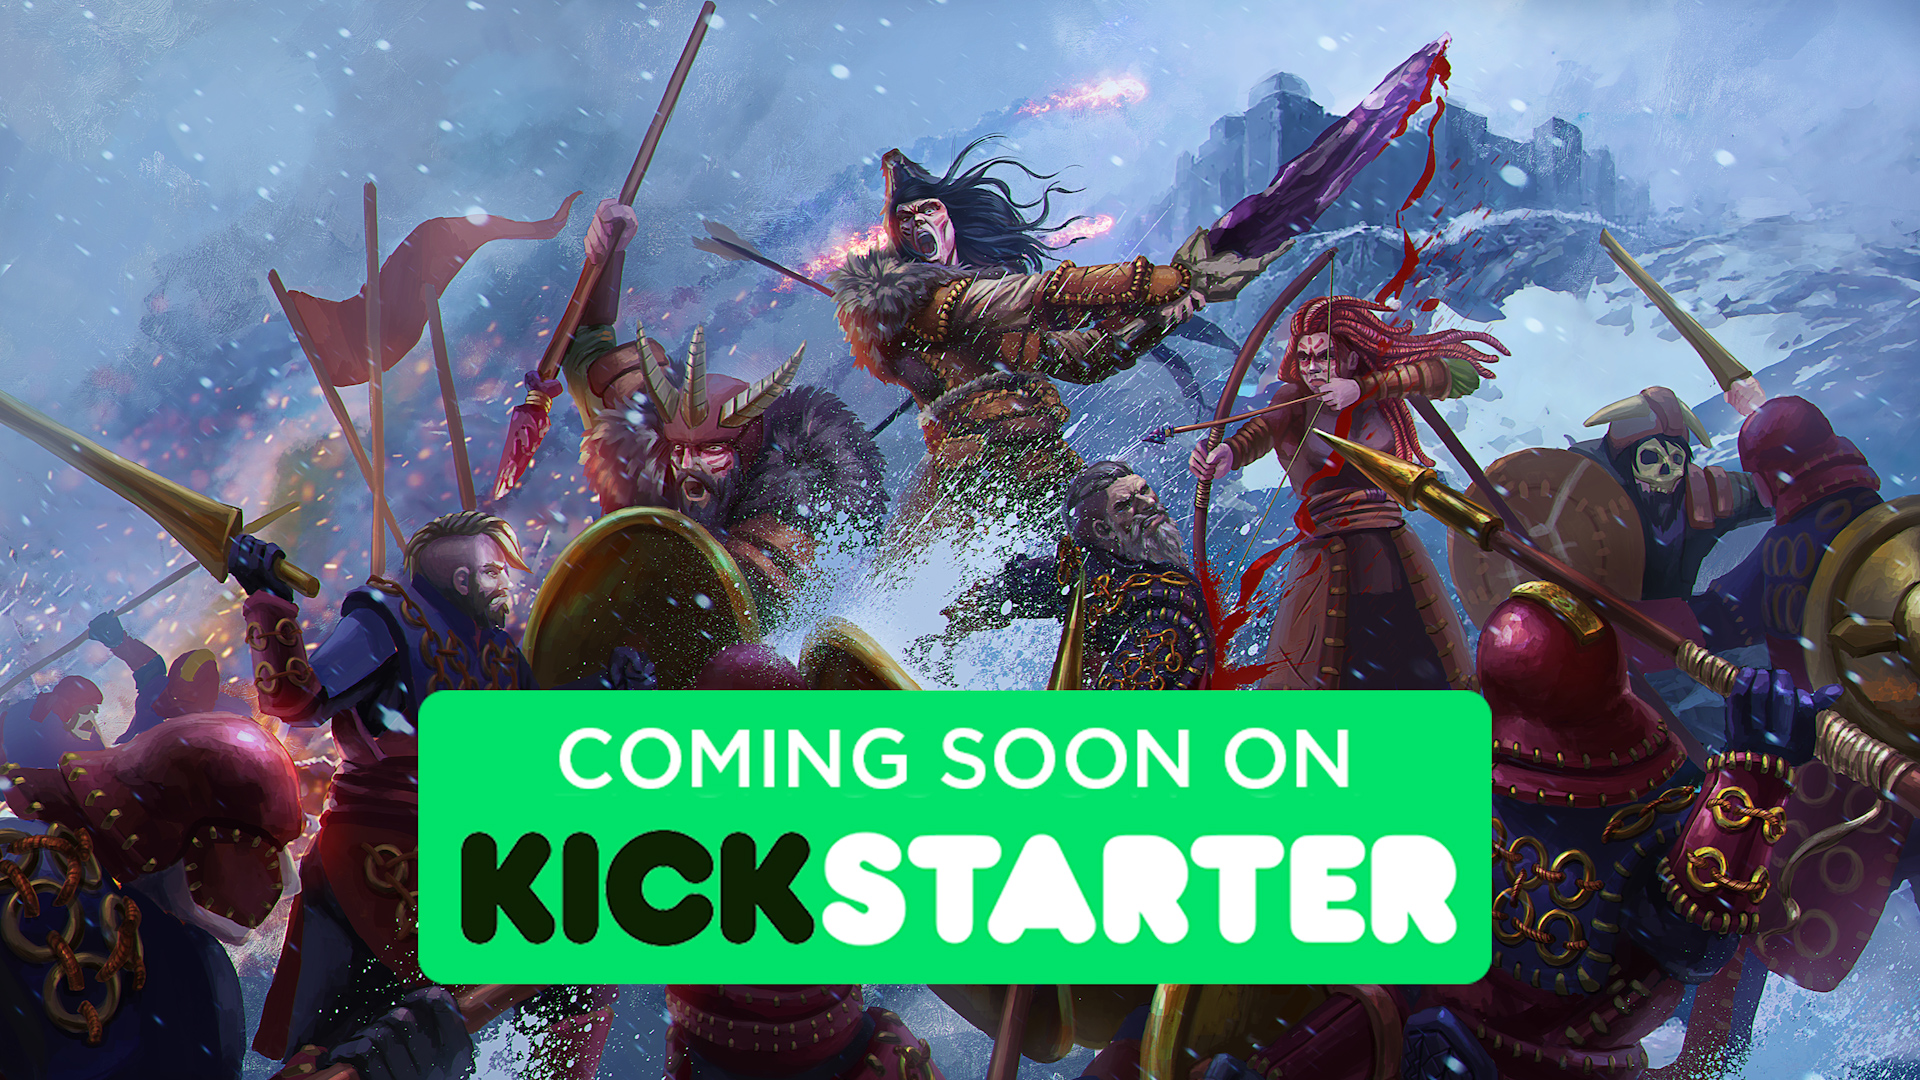 Coming to Kickstarter